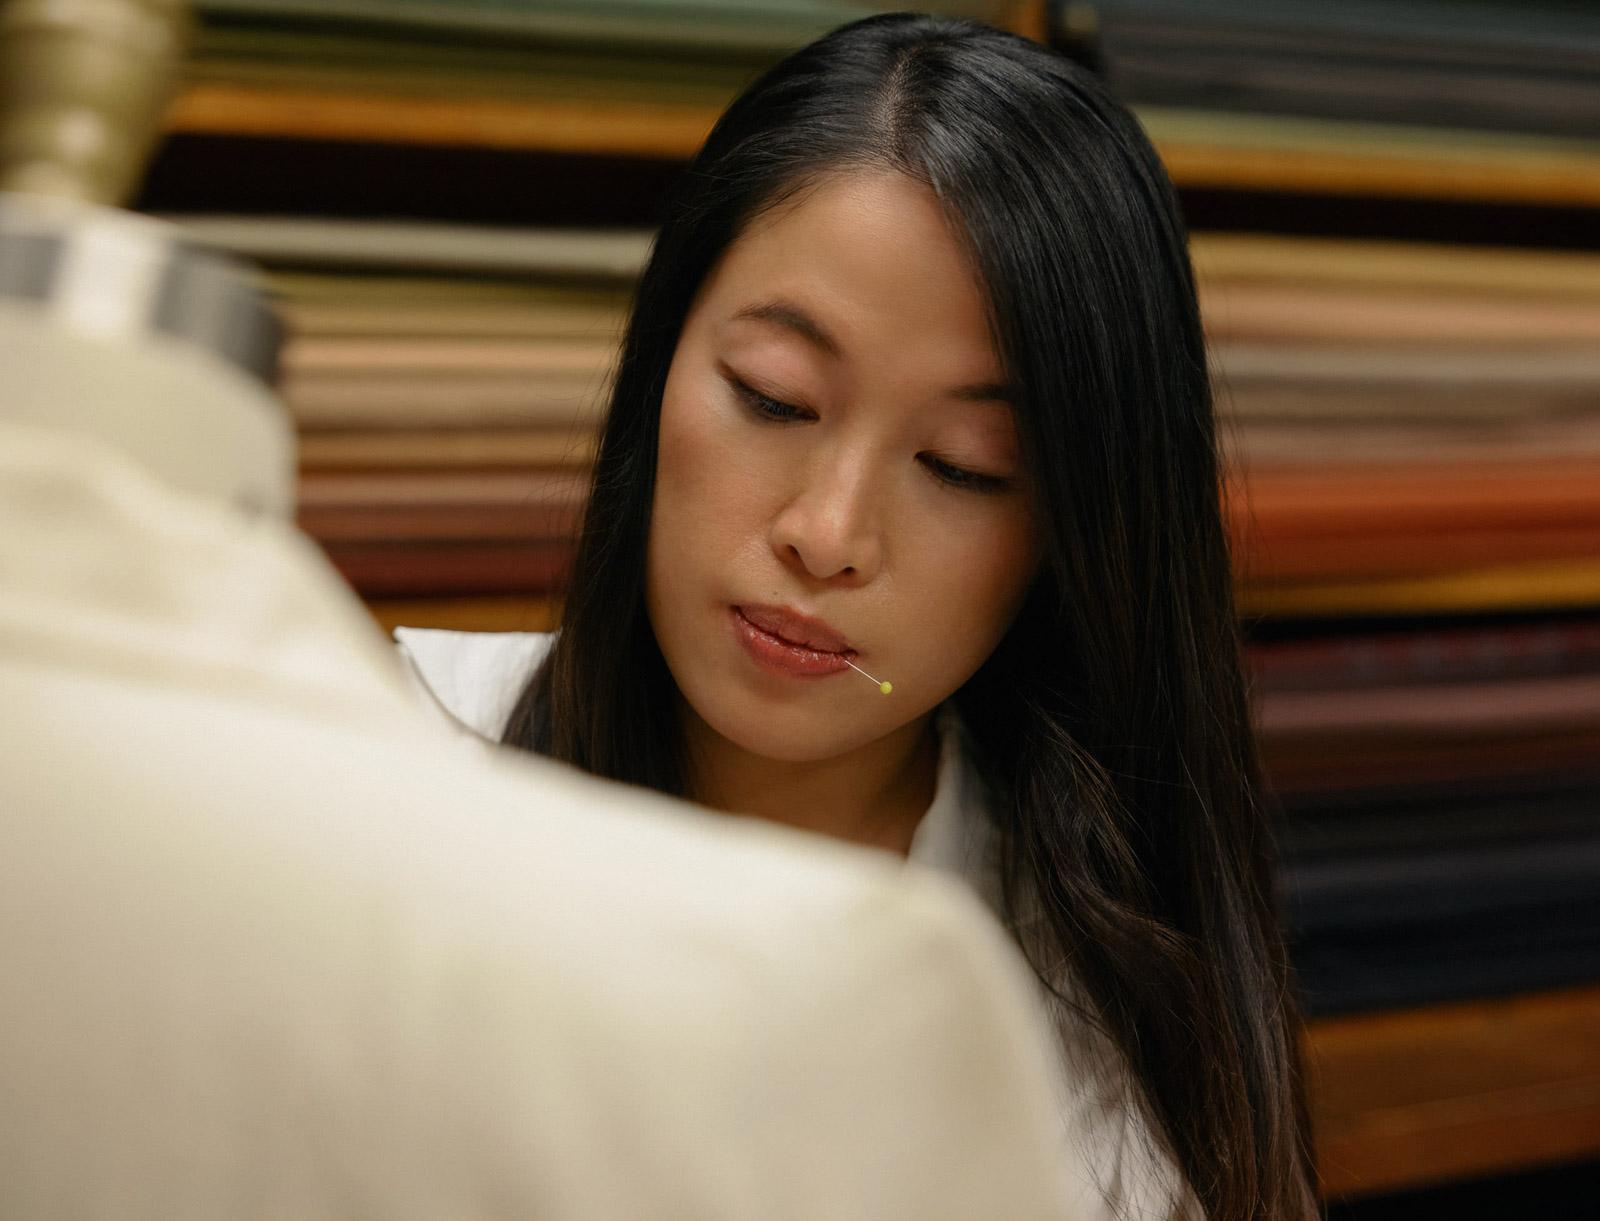 Mia Wu at Modernize Tailors